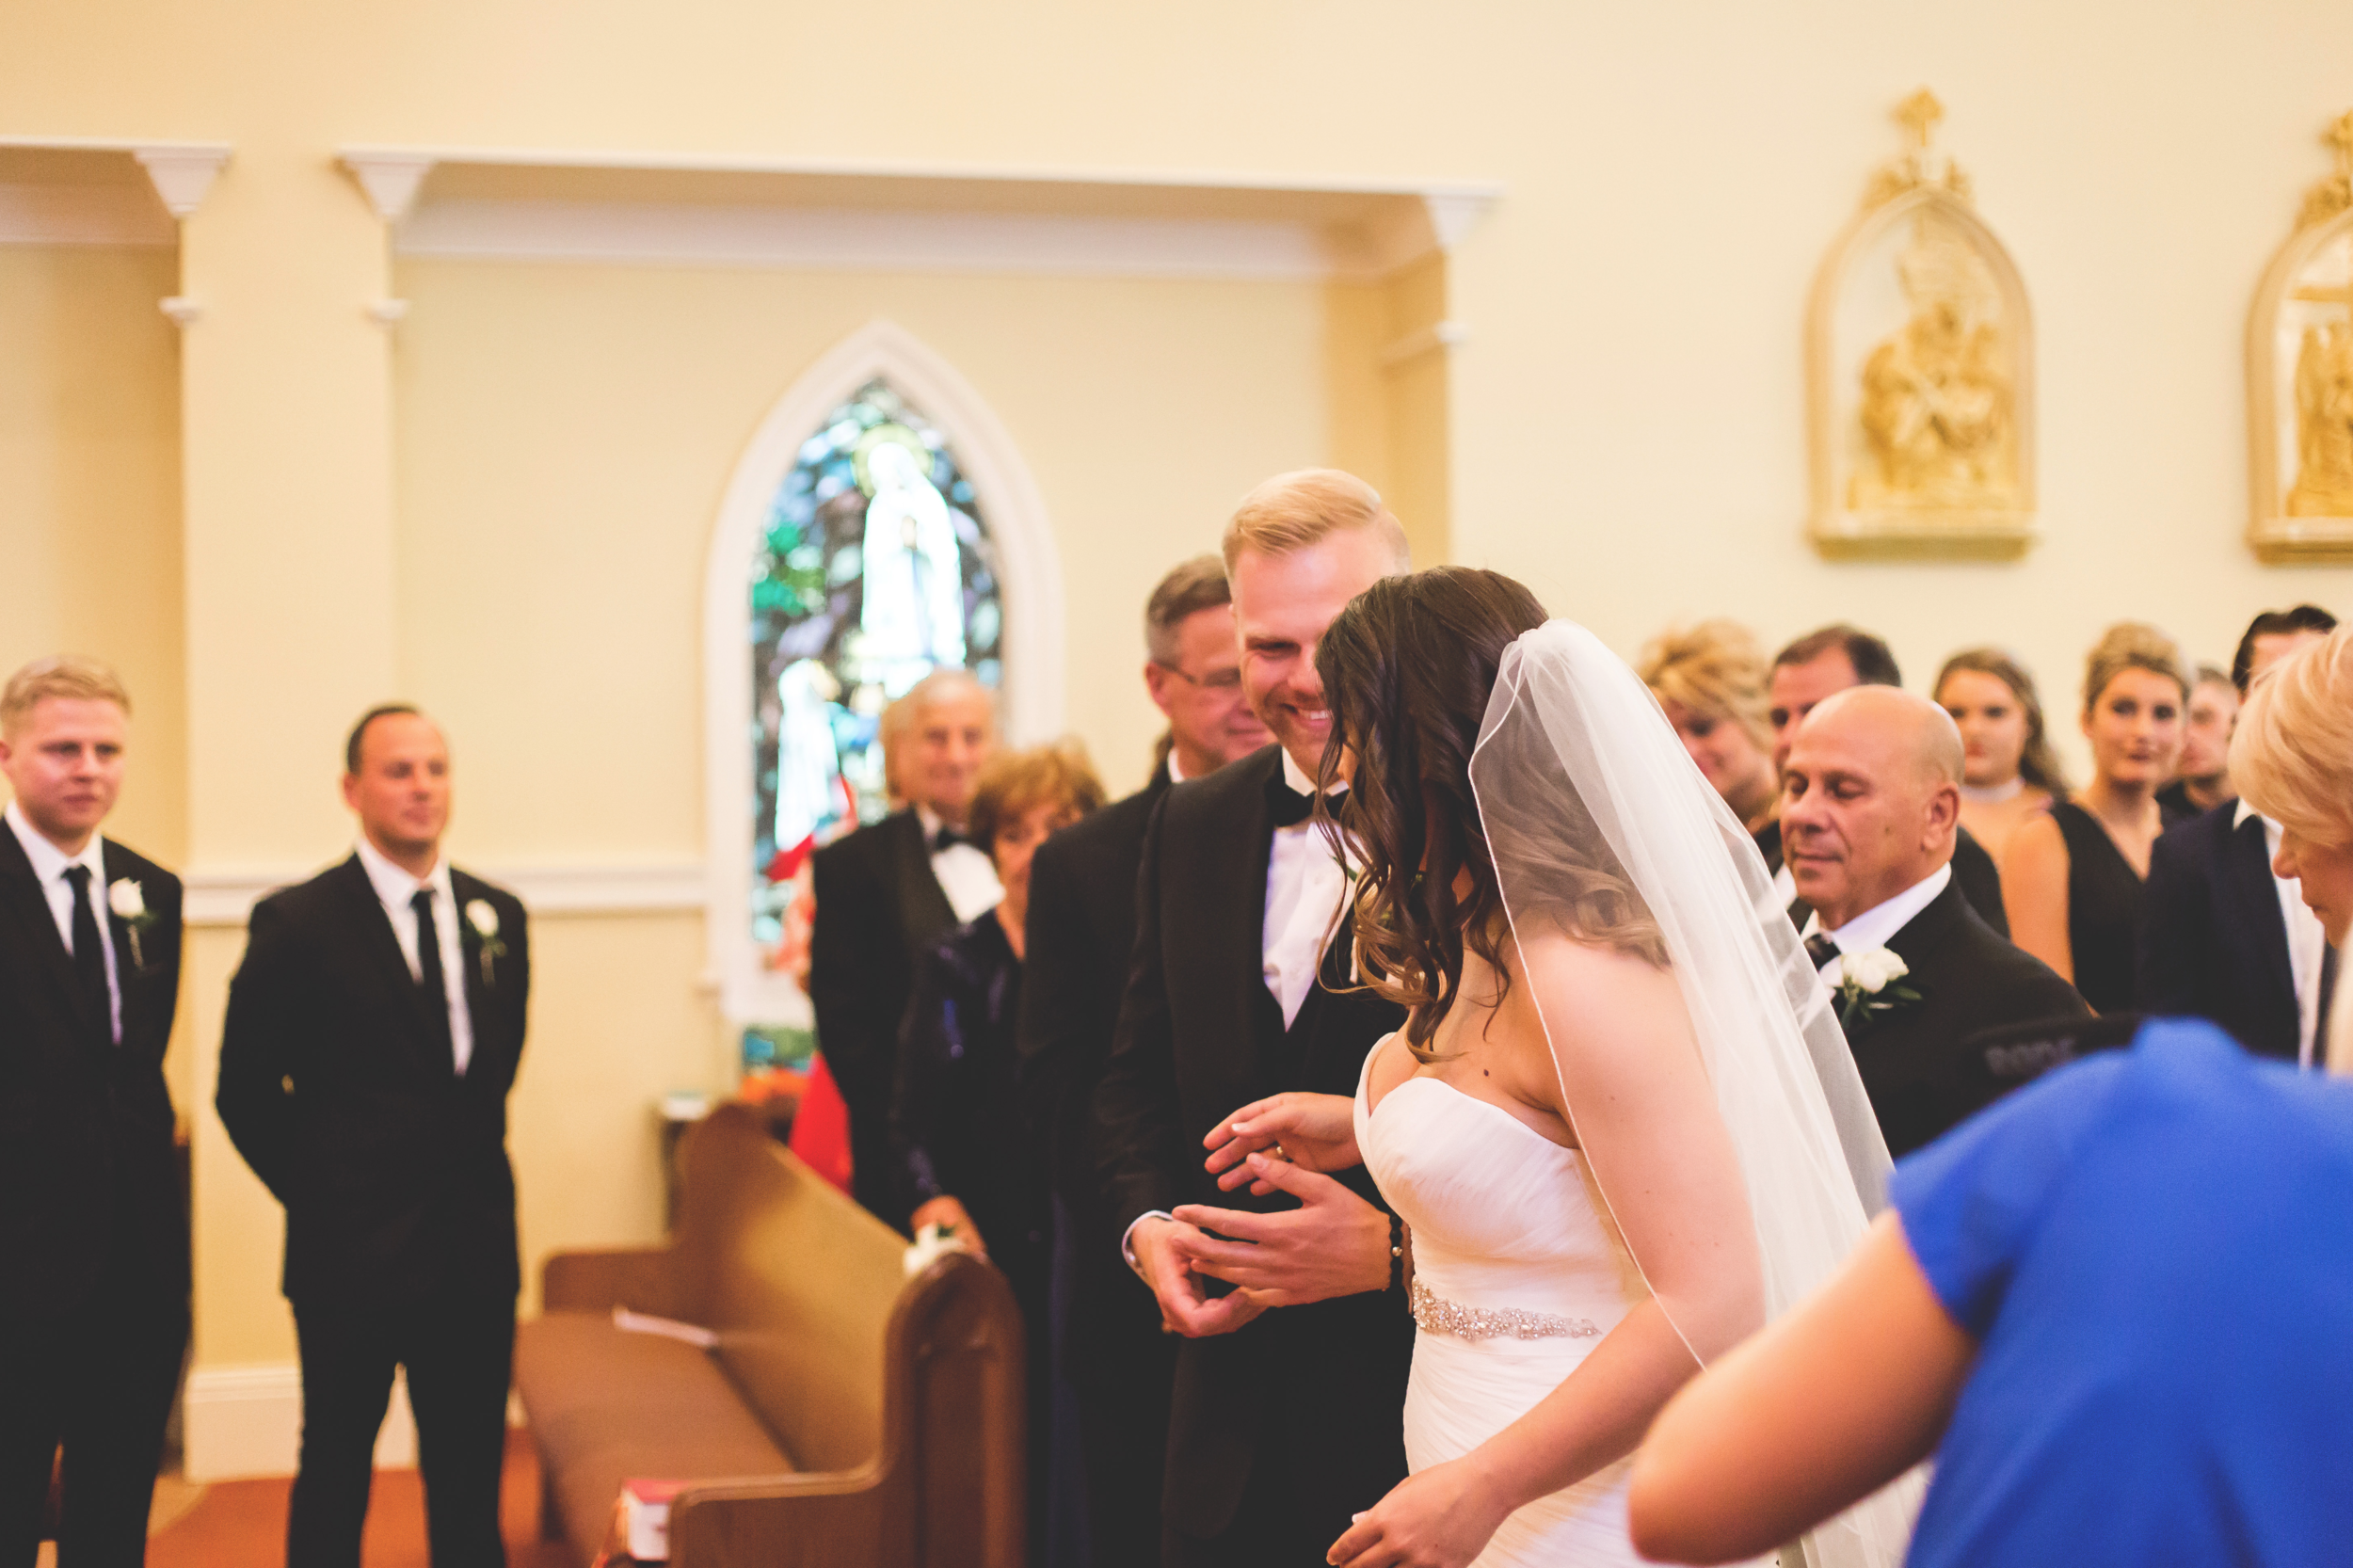 Wedding-Harbour-Banquet-Center-Oakville-Photographer-Wedding-Hamilton-Saint-James-Espresso-Downtown-HamOnt-GTA-Niagara-Toronto-Moments-by-Lauren-Photography-Photo-Image-14.png